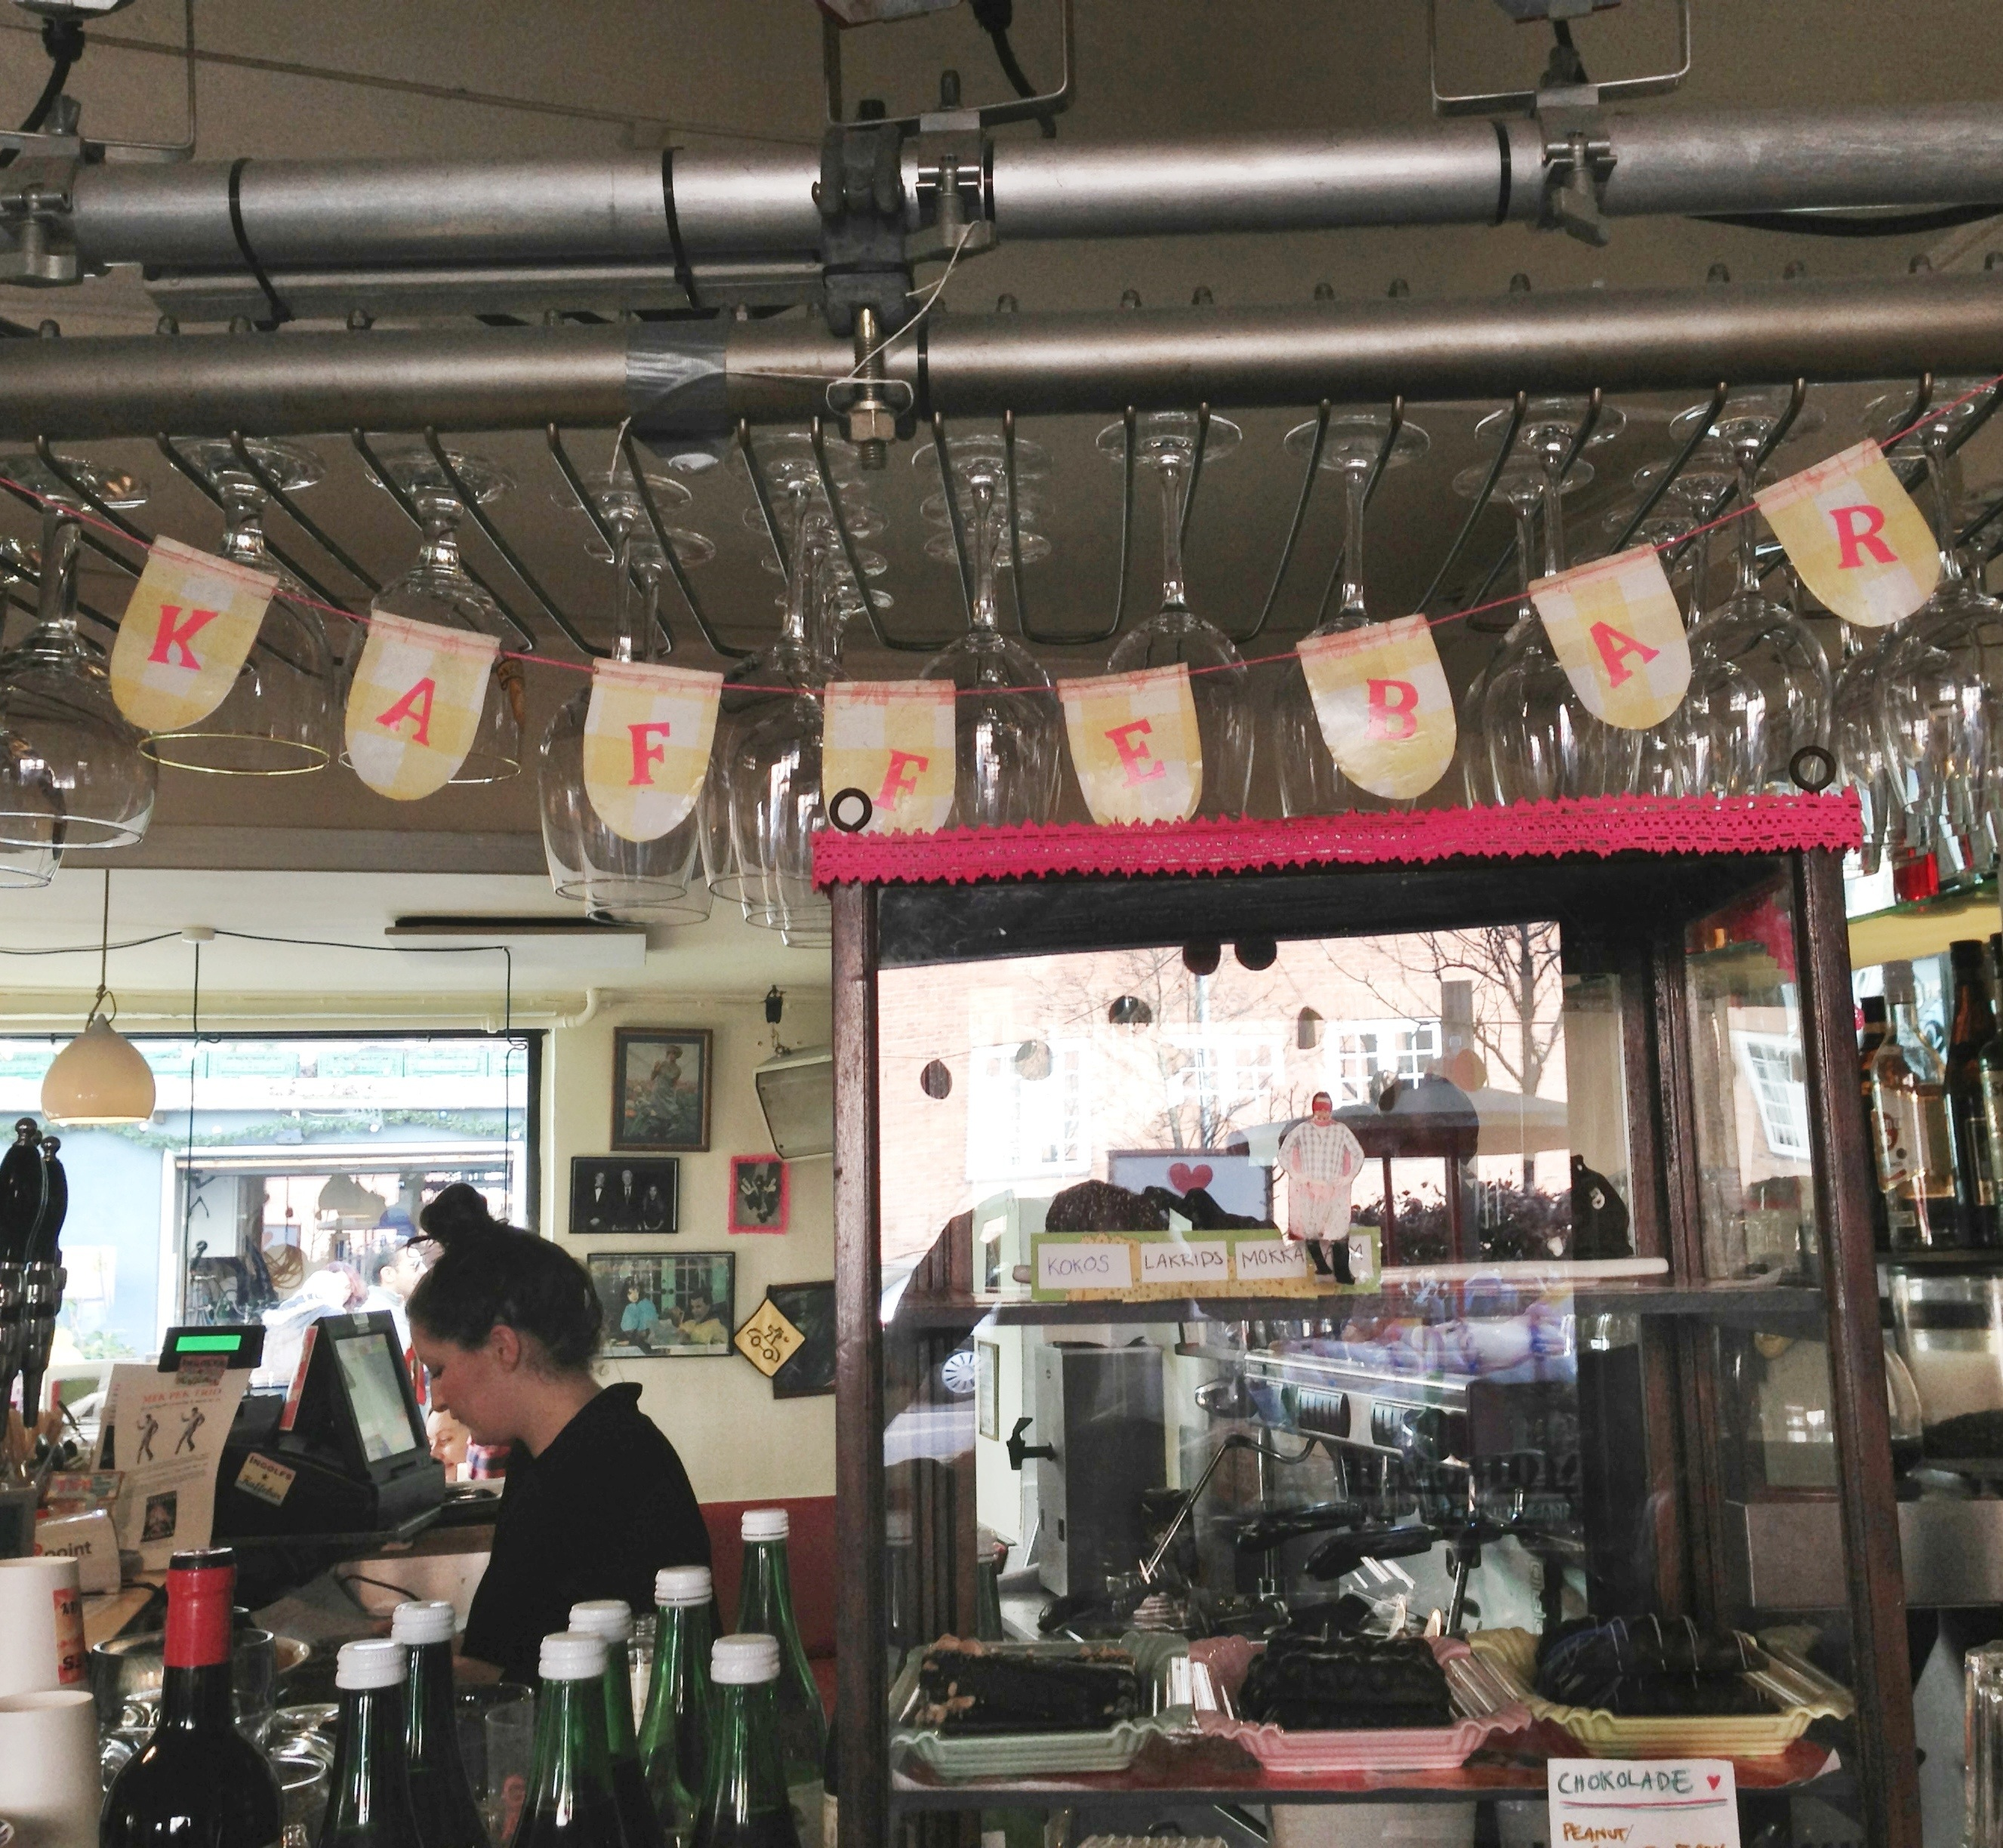 Ingolfs Kaffebar